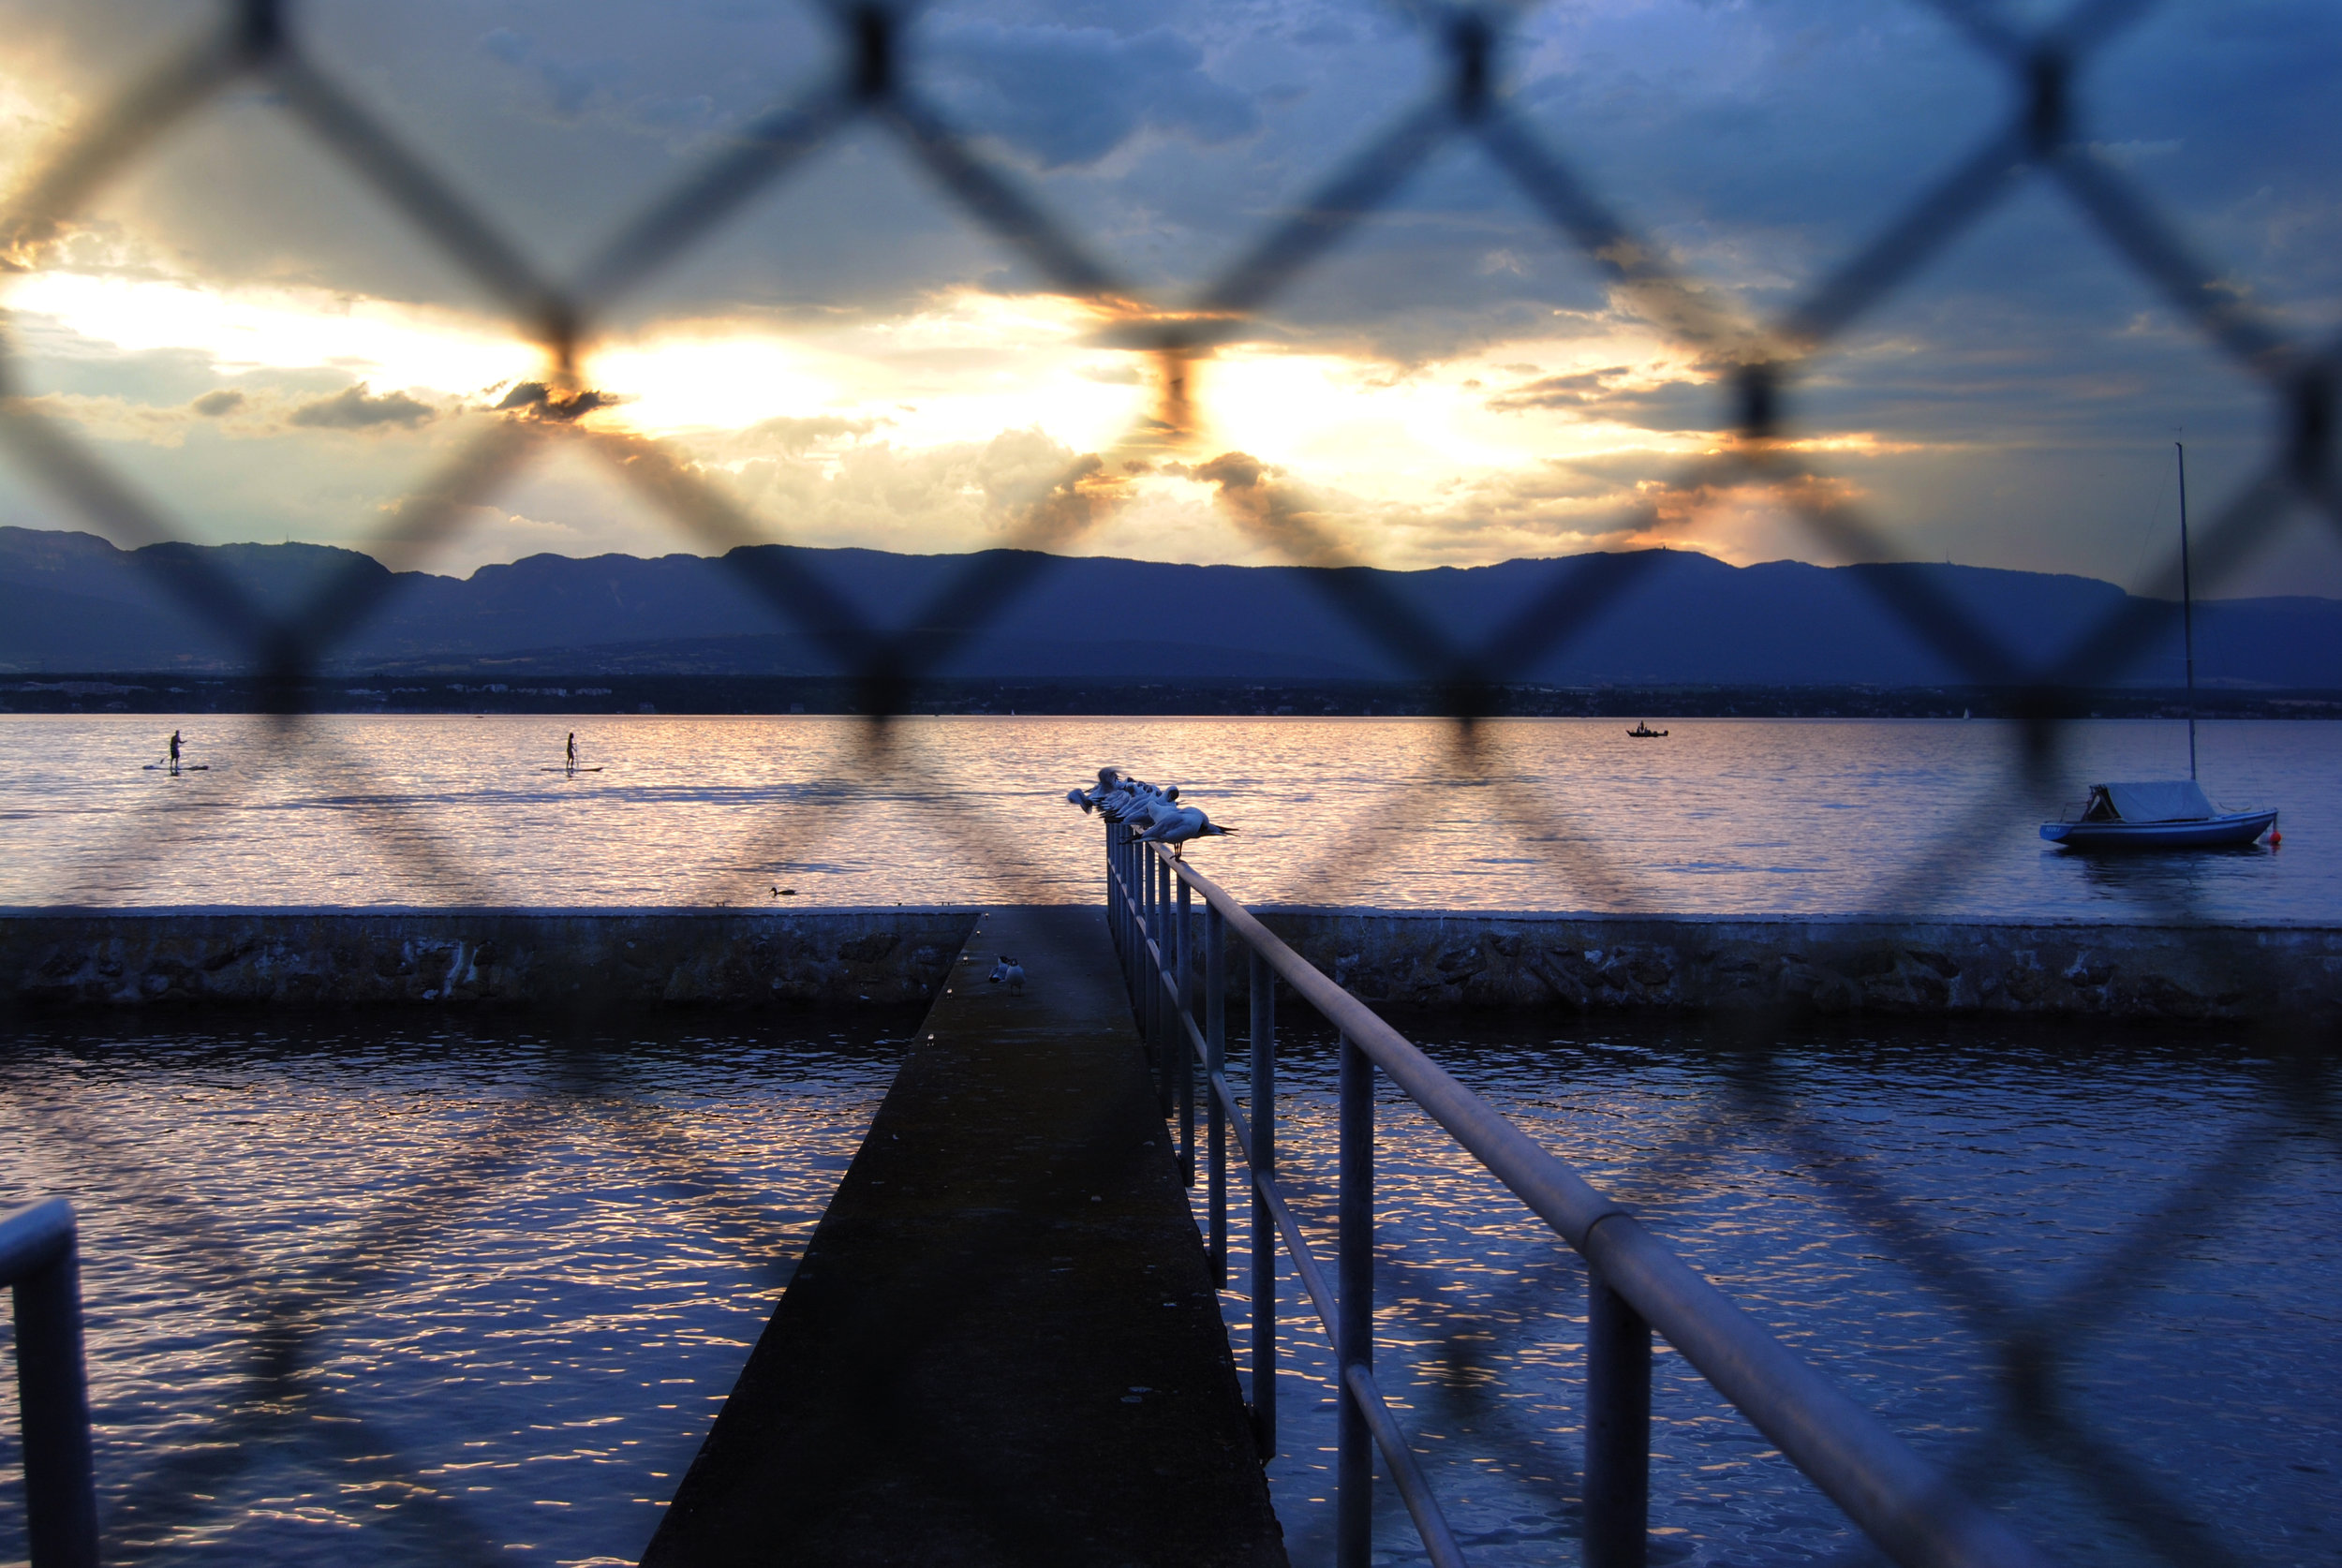 The Lake - Sophie Smyke